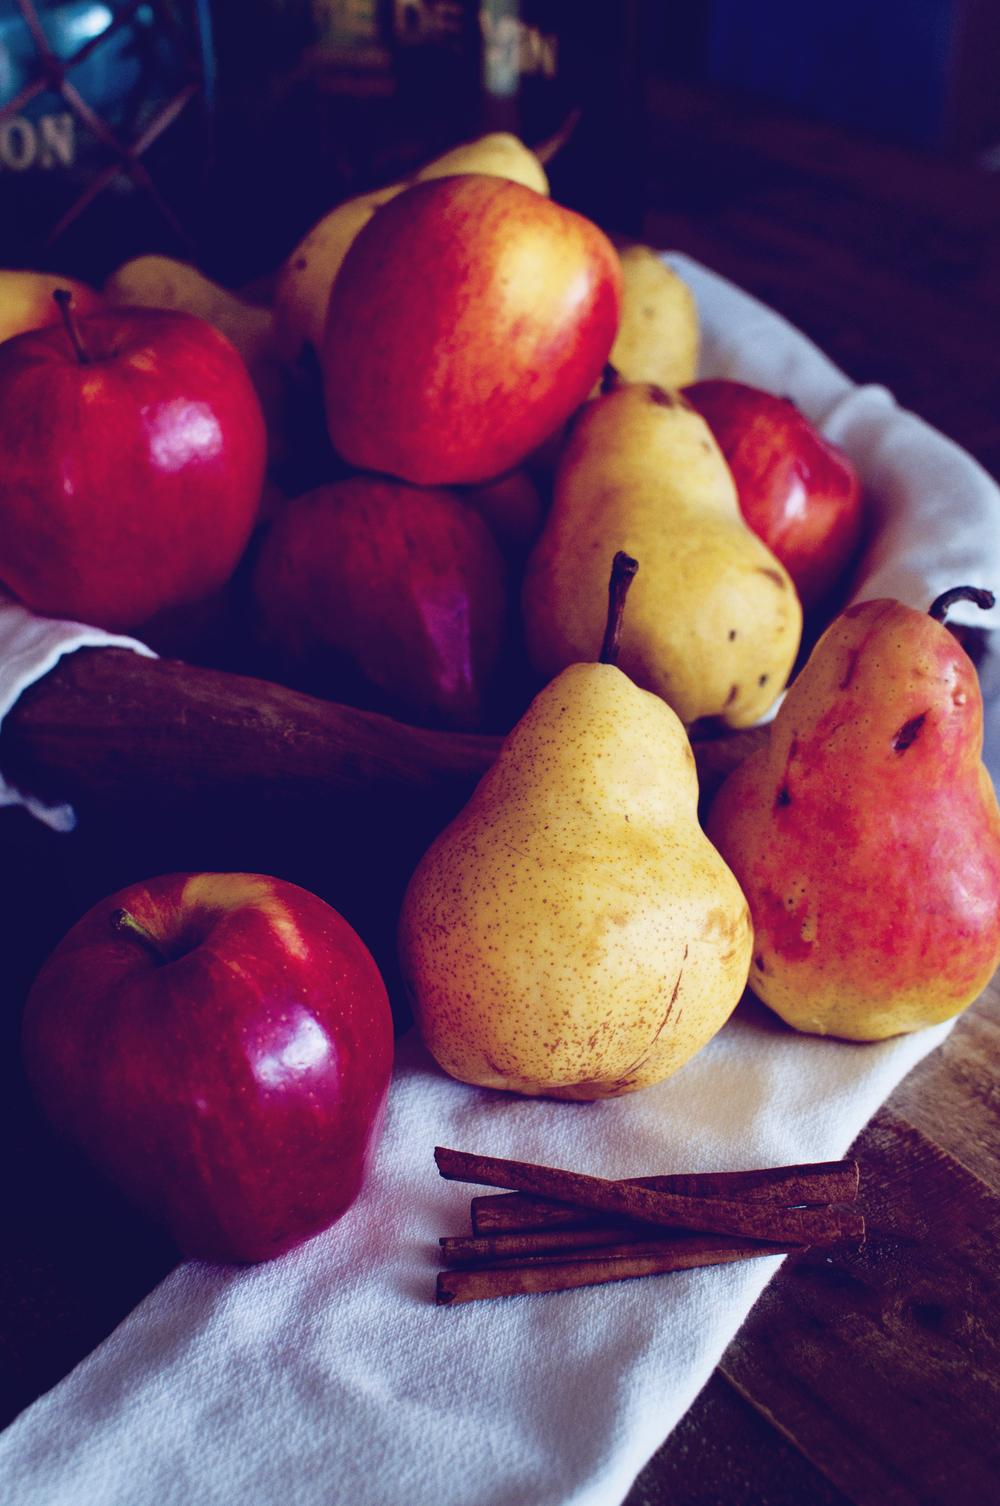 Pears and Apples.jpg